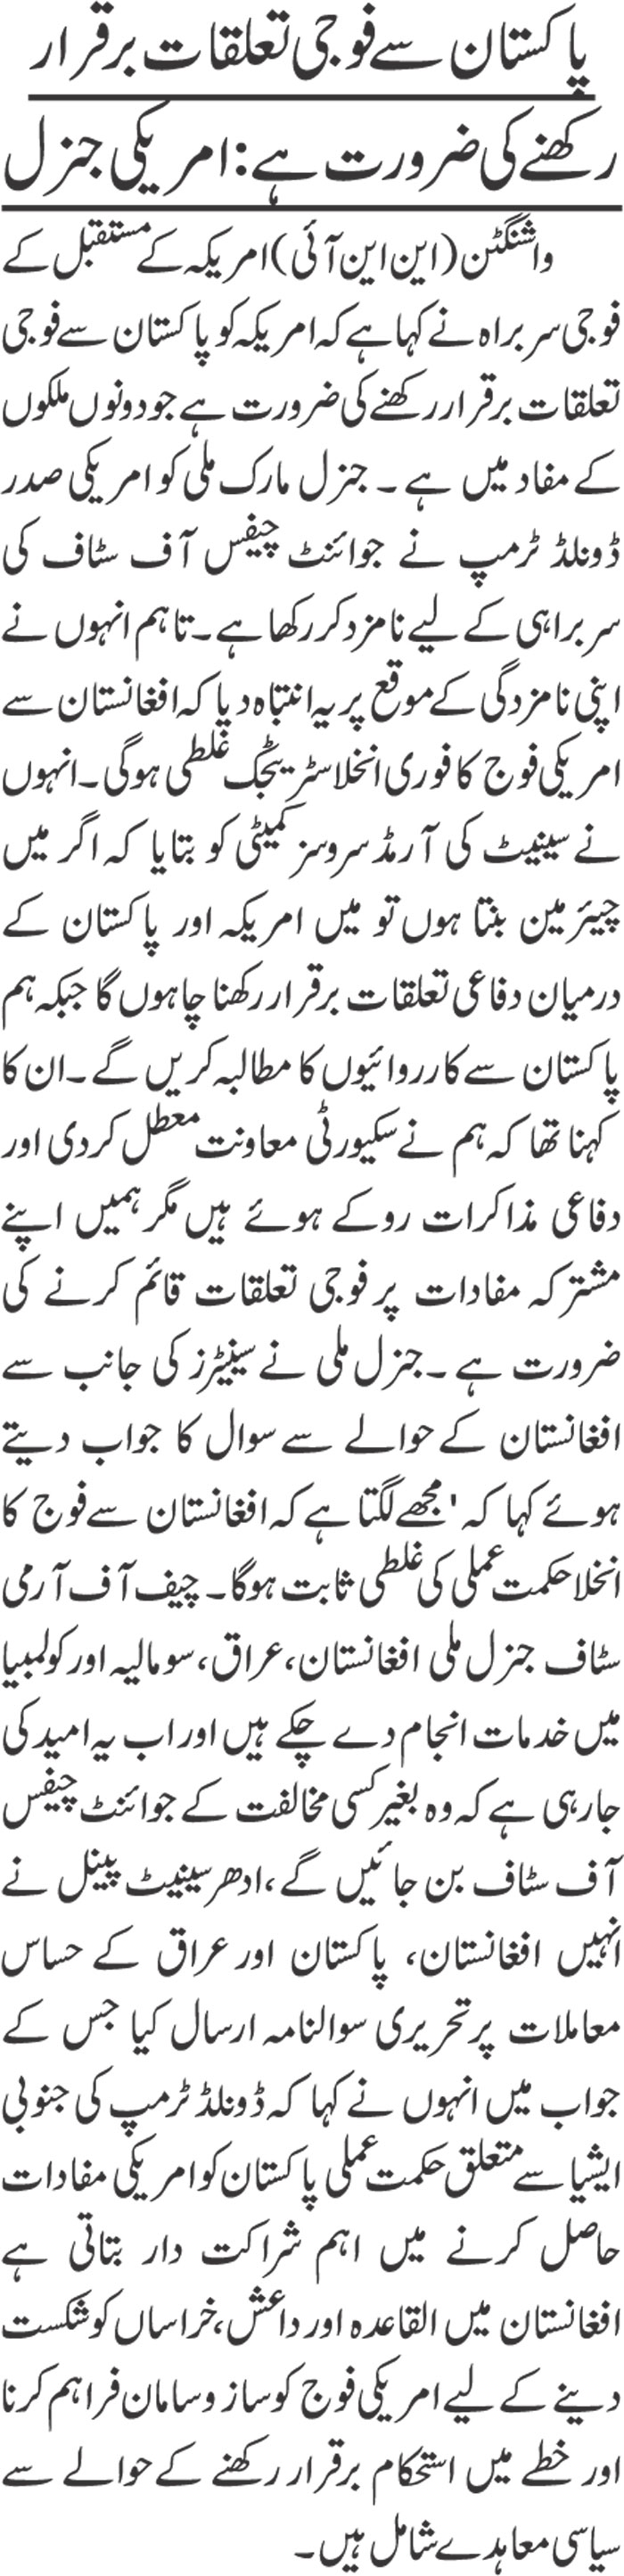 Daily 92 Roznama ePaper - پاکستان سے فوجی تعلقات برقرار رکھنے کی ضرورت ہے : امریکی جنرل